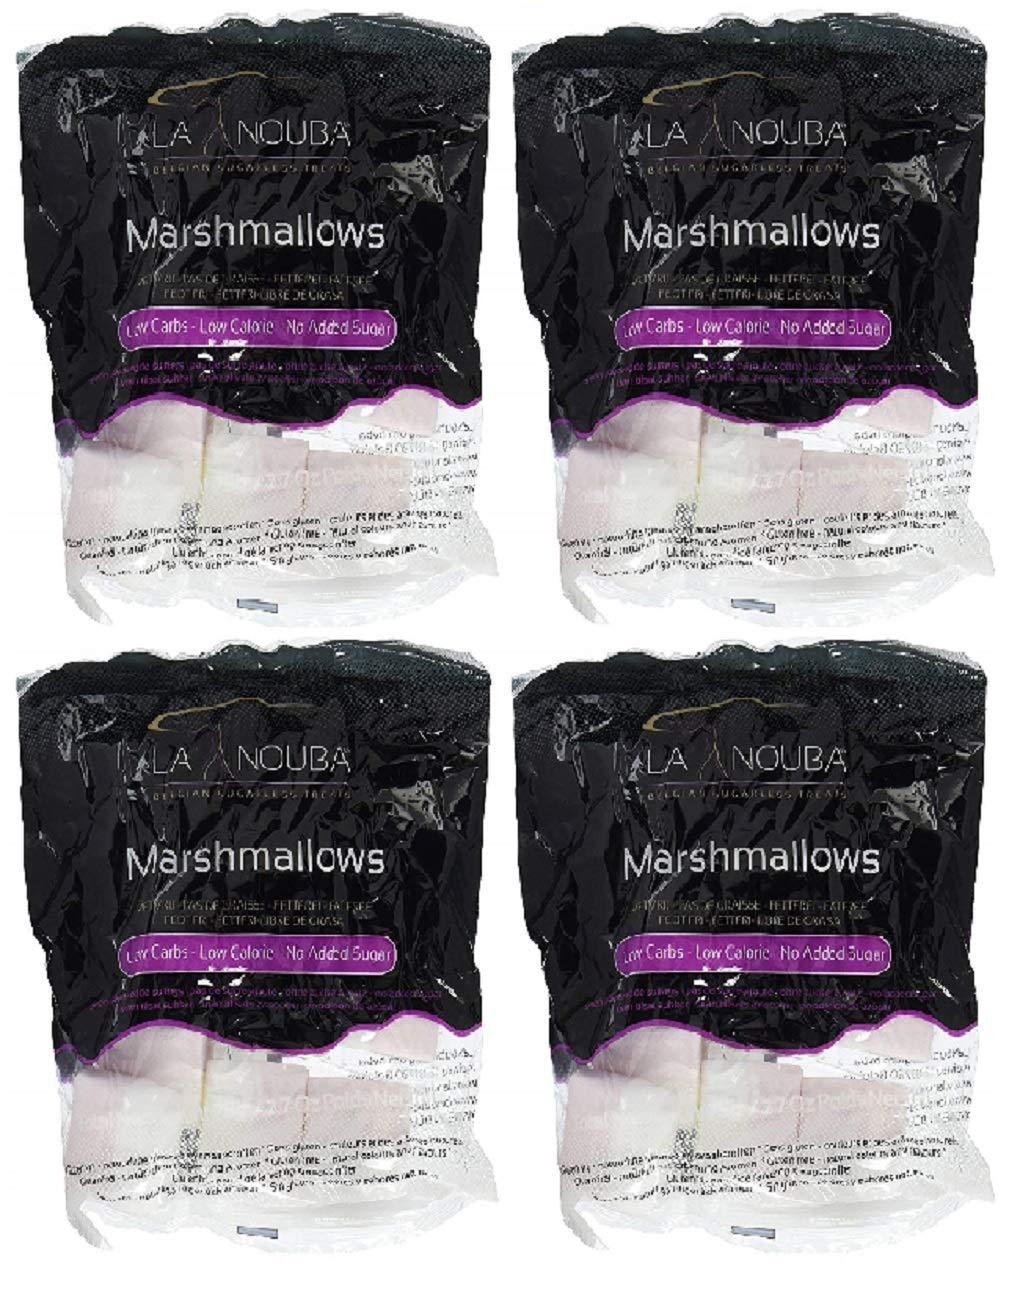 4 Pack Value: La Nouba, Sugar Free Marshmallow, Fat Free Gluten Free, 10.8 oz.total (4 Pack)